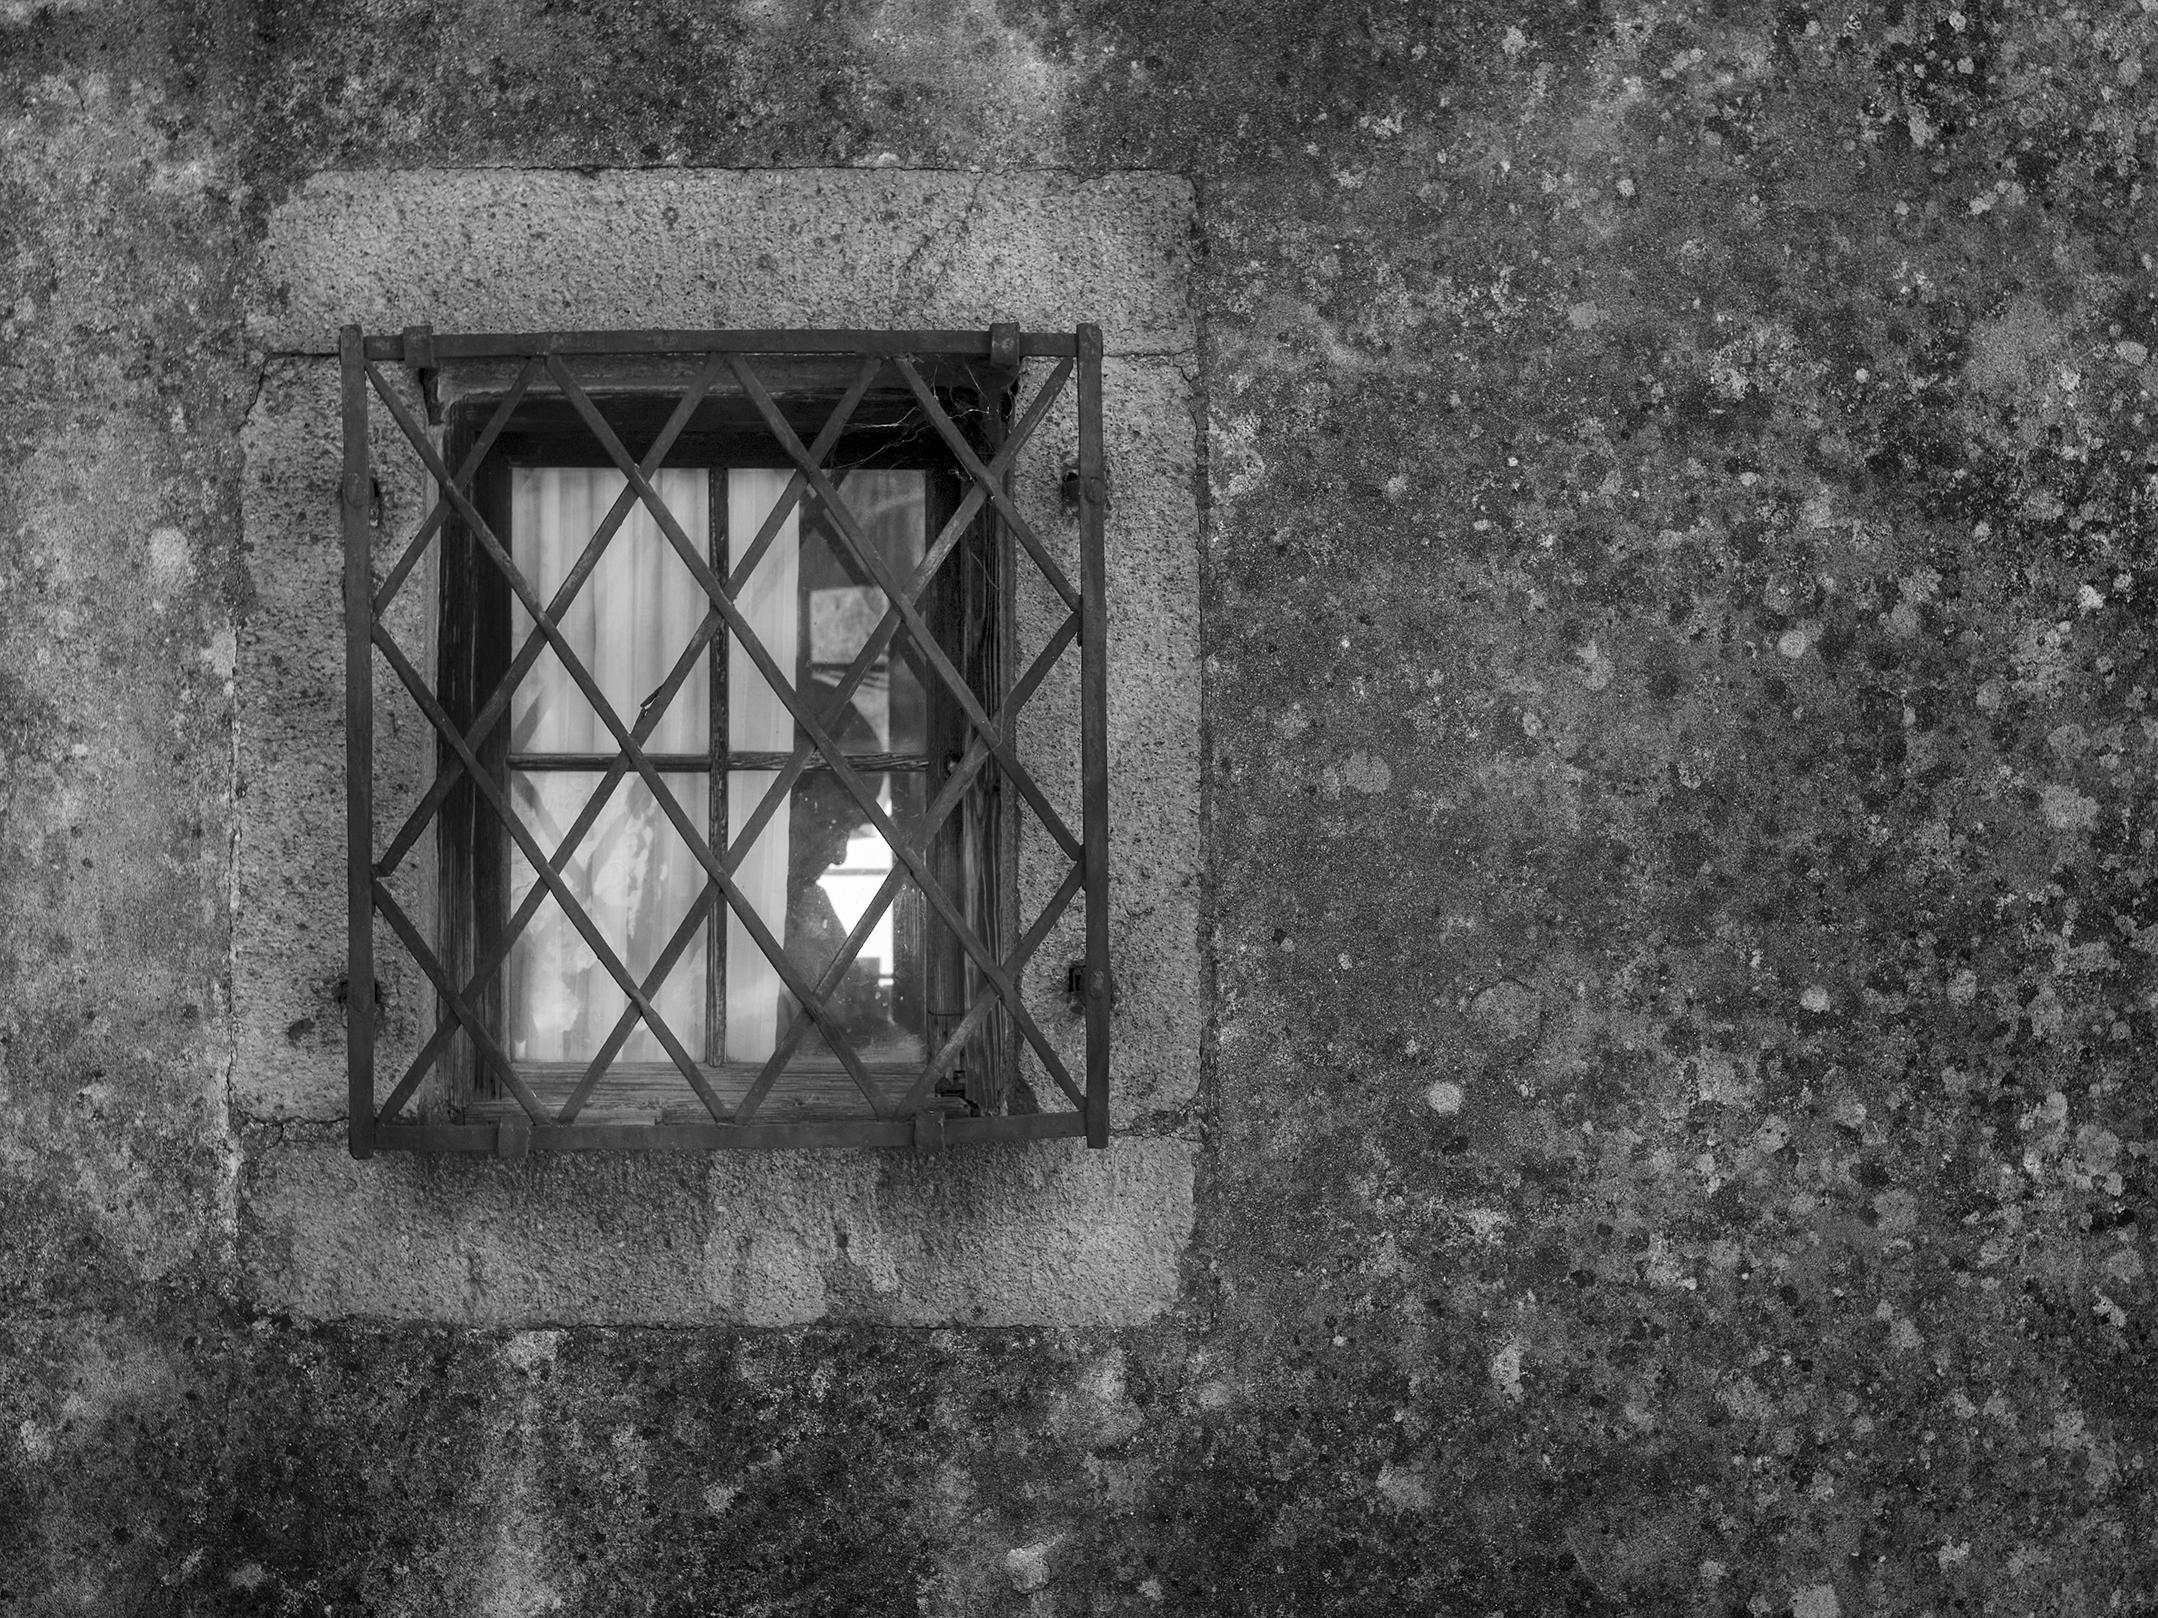 Behind the window......